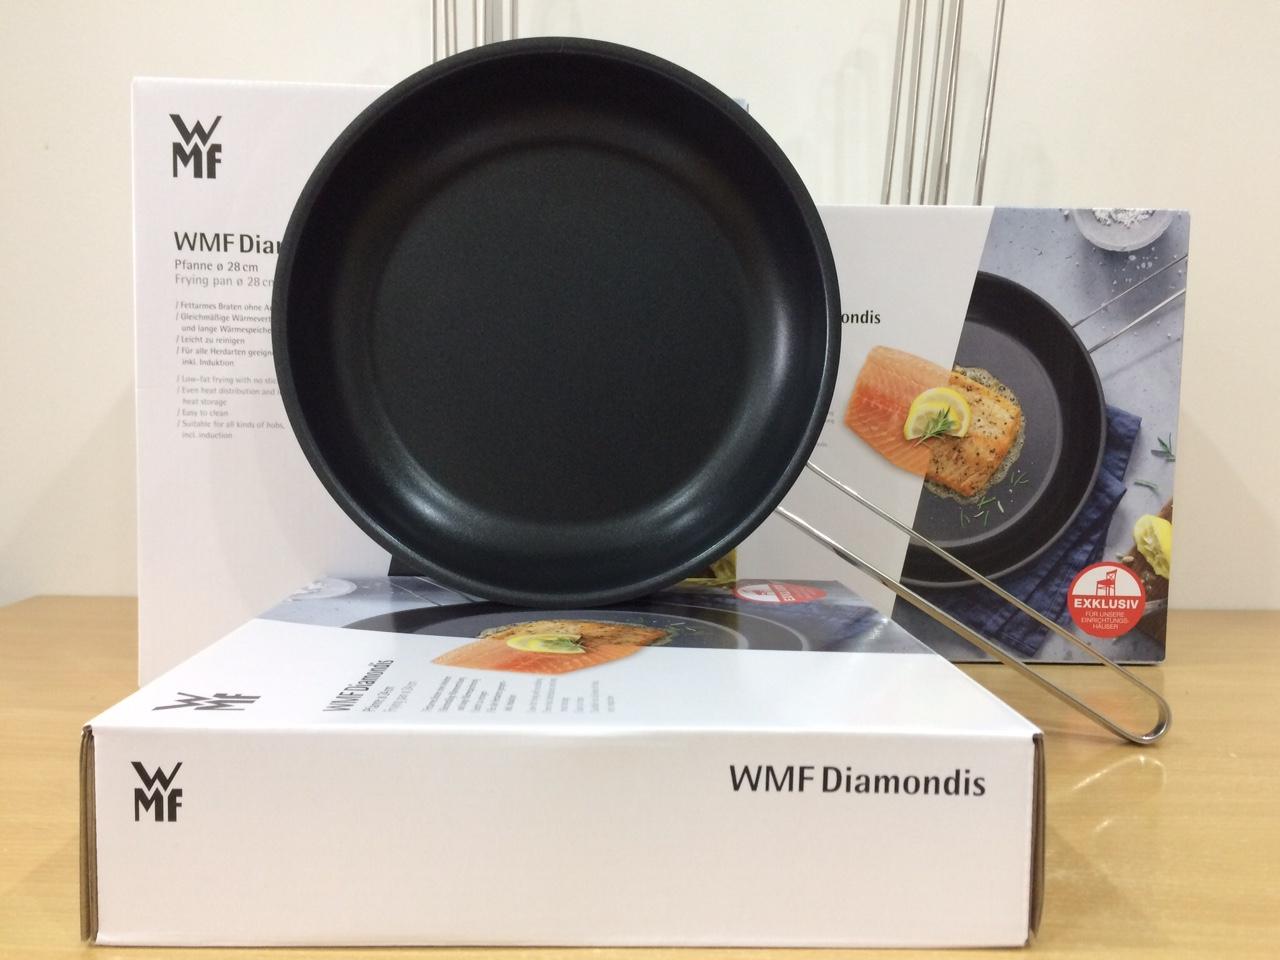 Cặp Chảo chống dính WMF Diamondis 24cm & 28cm